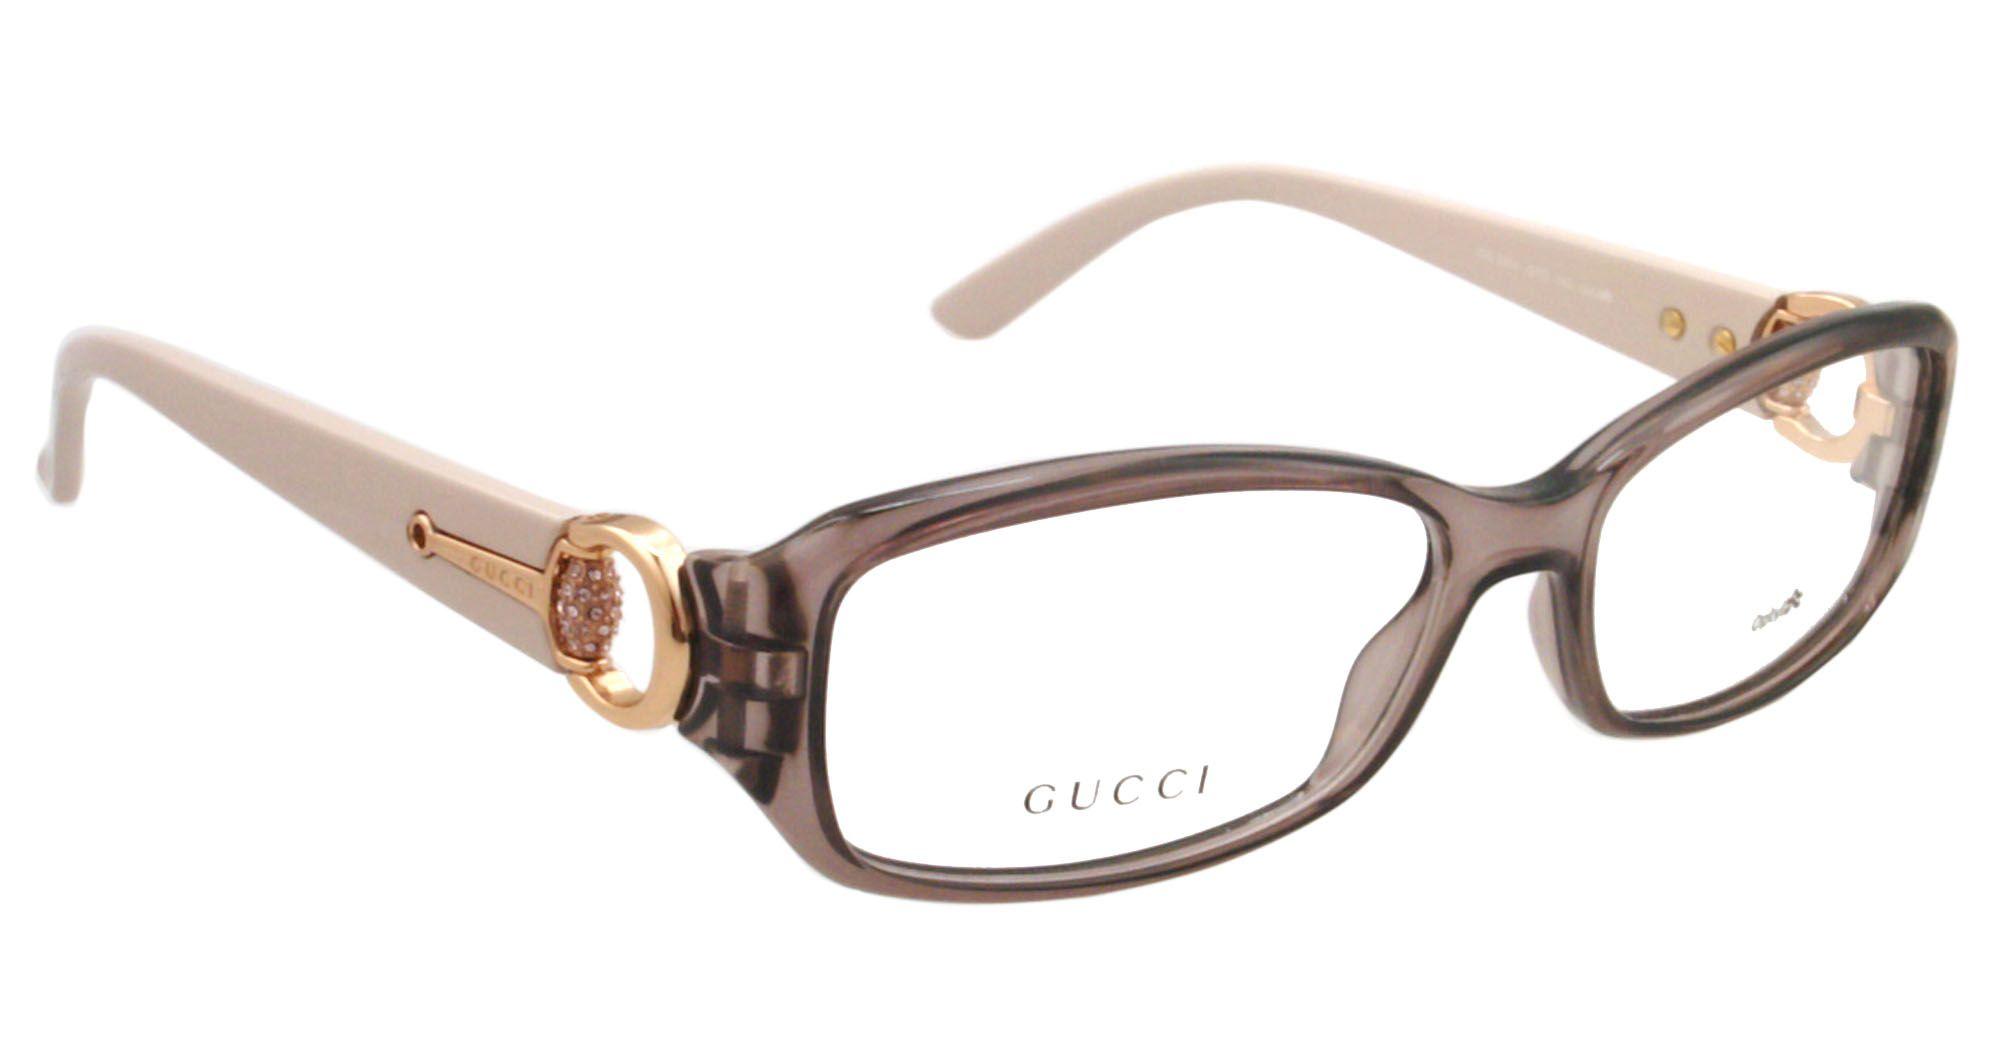 bfde1442d1 NEW Gucci Eyeglasses GG 3204 MAUVE BLUSH Q70 GG3204 AUTH